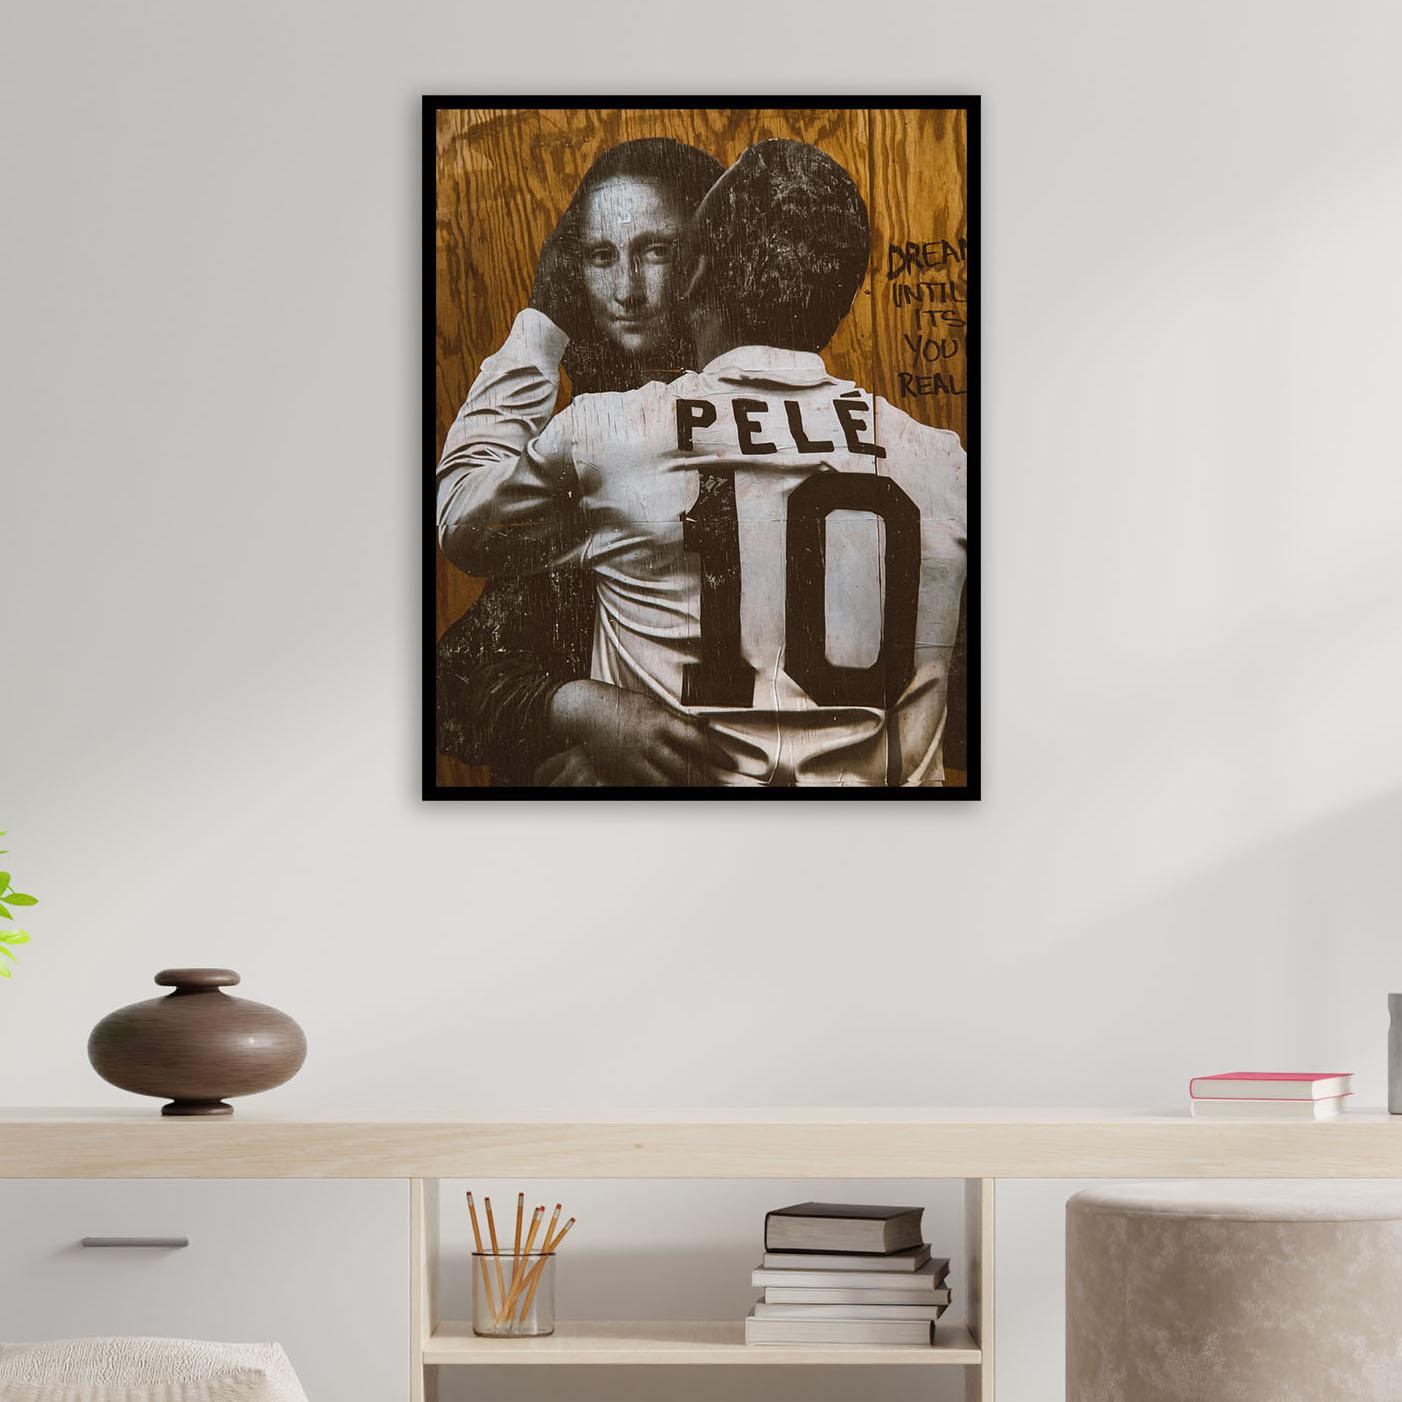 Quadro Pelé e Monalisa